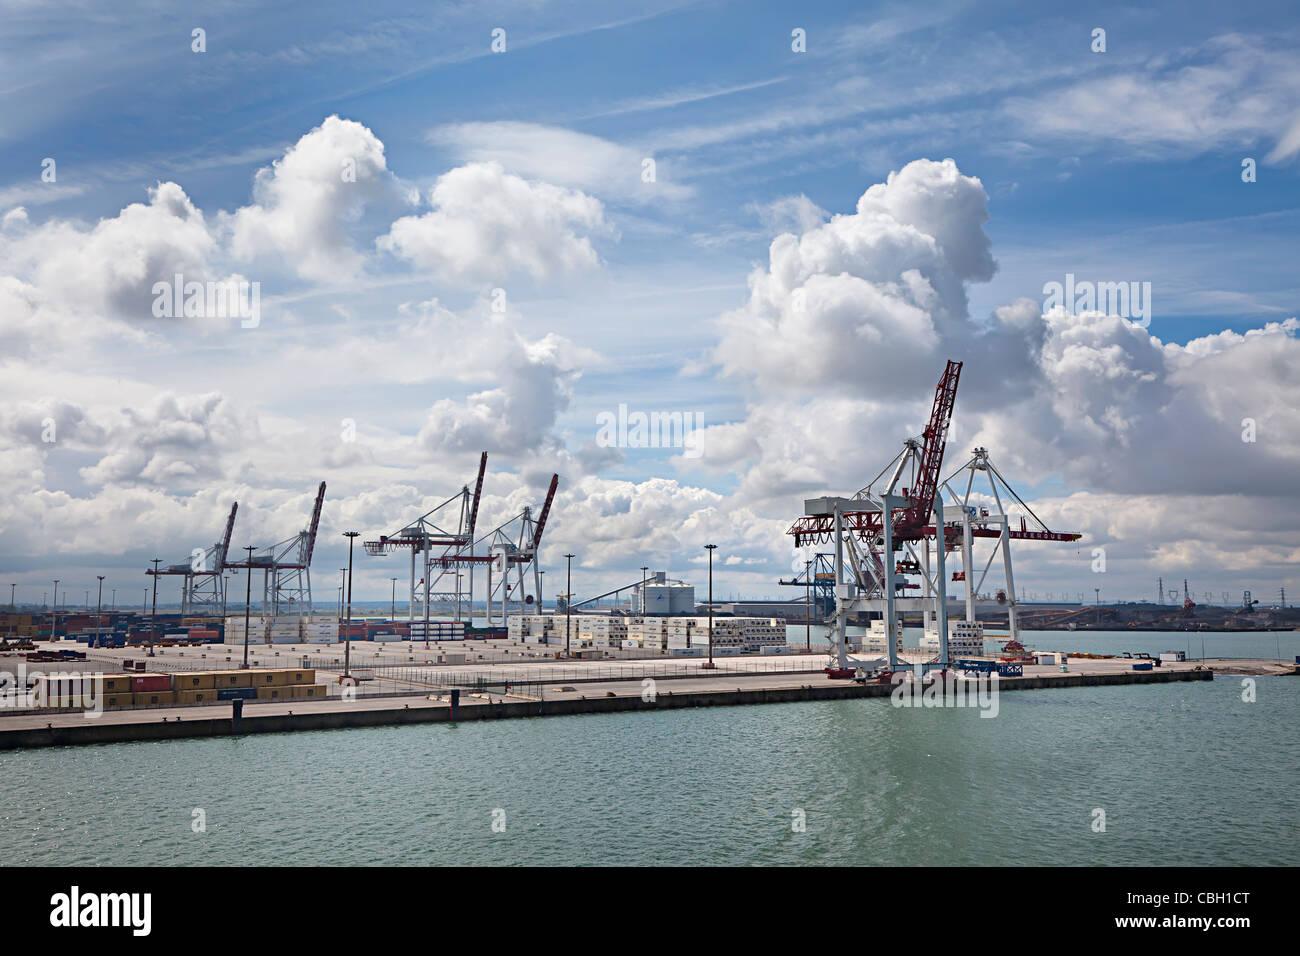 Harbour cranes Dunkirk France - Stock Image